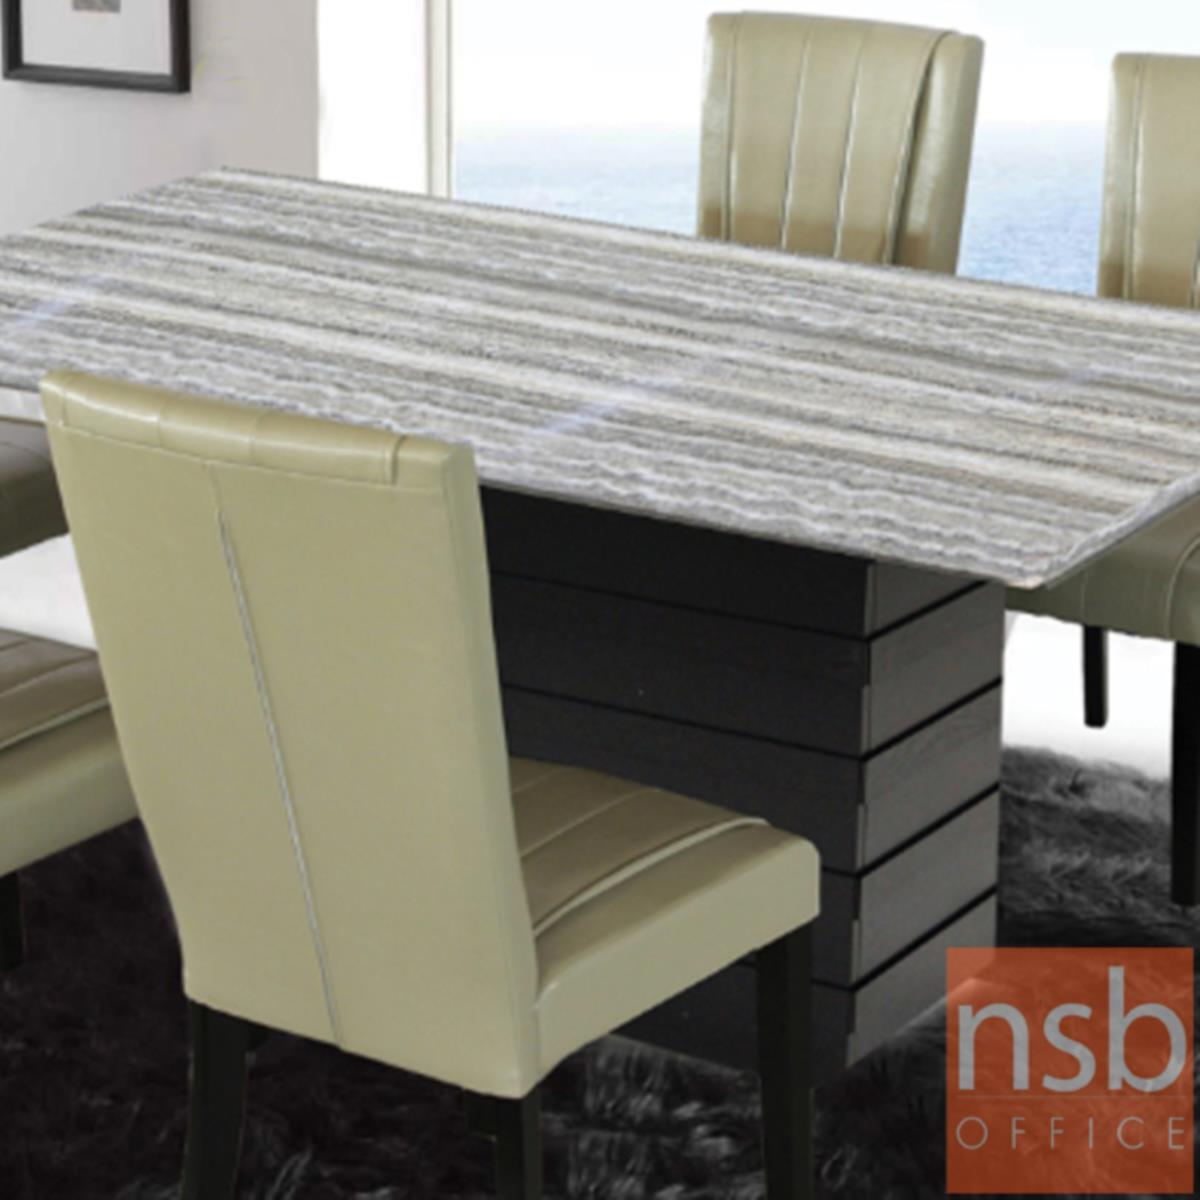 G14A166:โต๊ะรับประทานอาหารหน้าหินอ่อน รุ่น Stansfield (สแตนส์ฟิลด์) ขนาด 180W cm.  โครงขาไม้